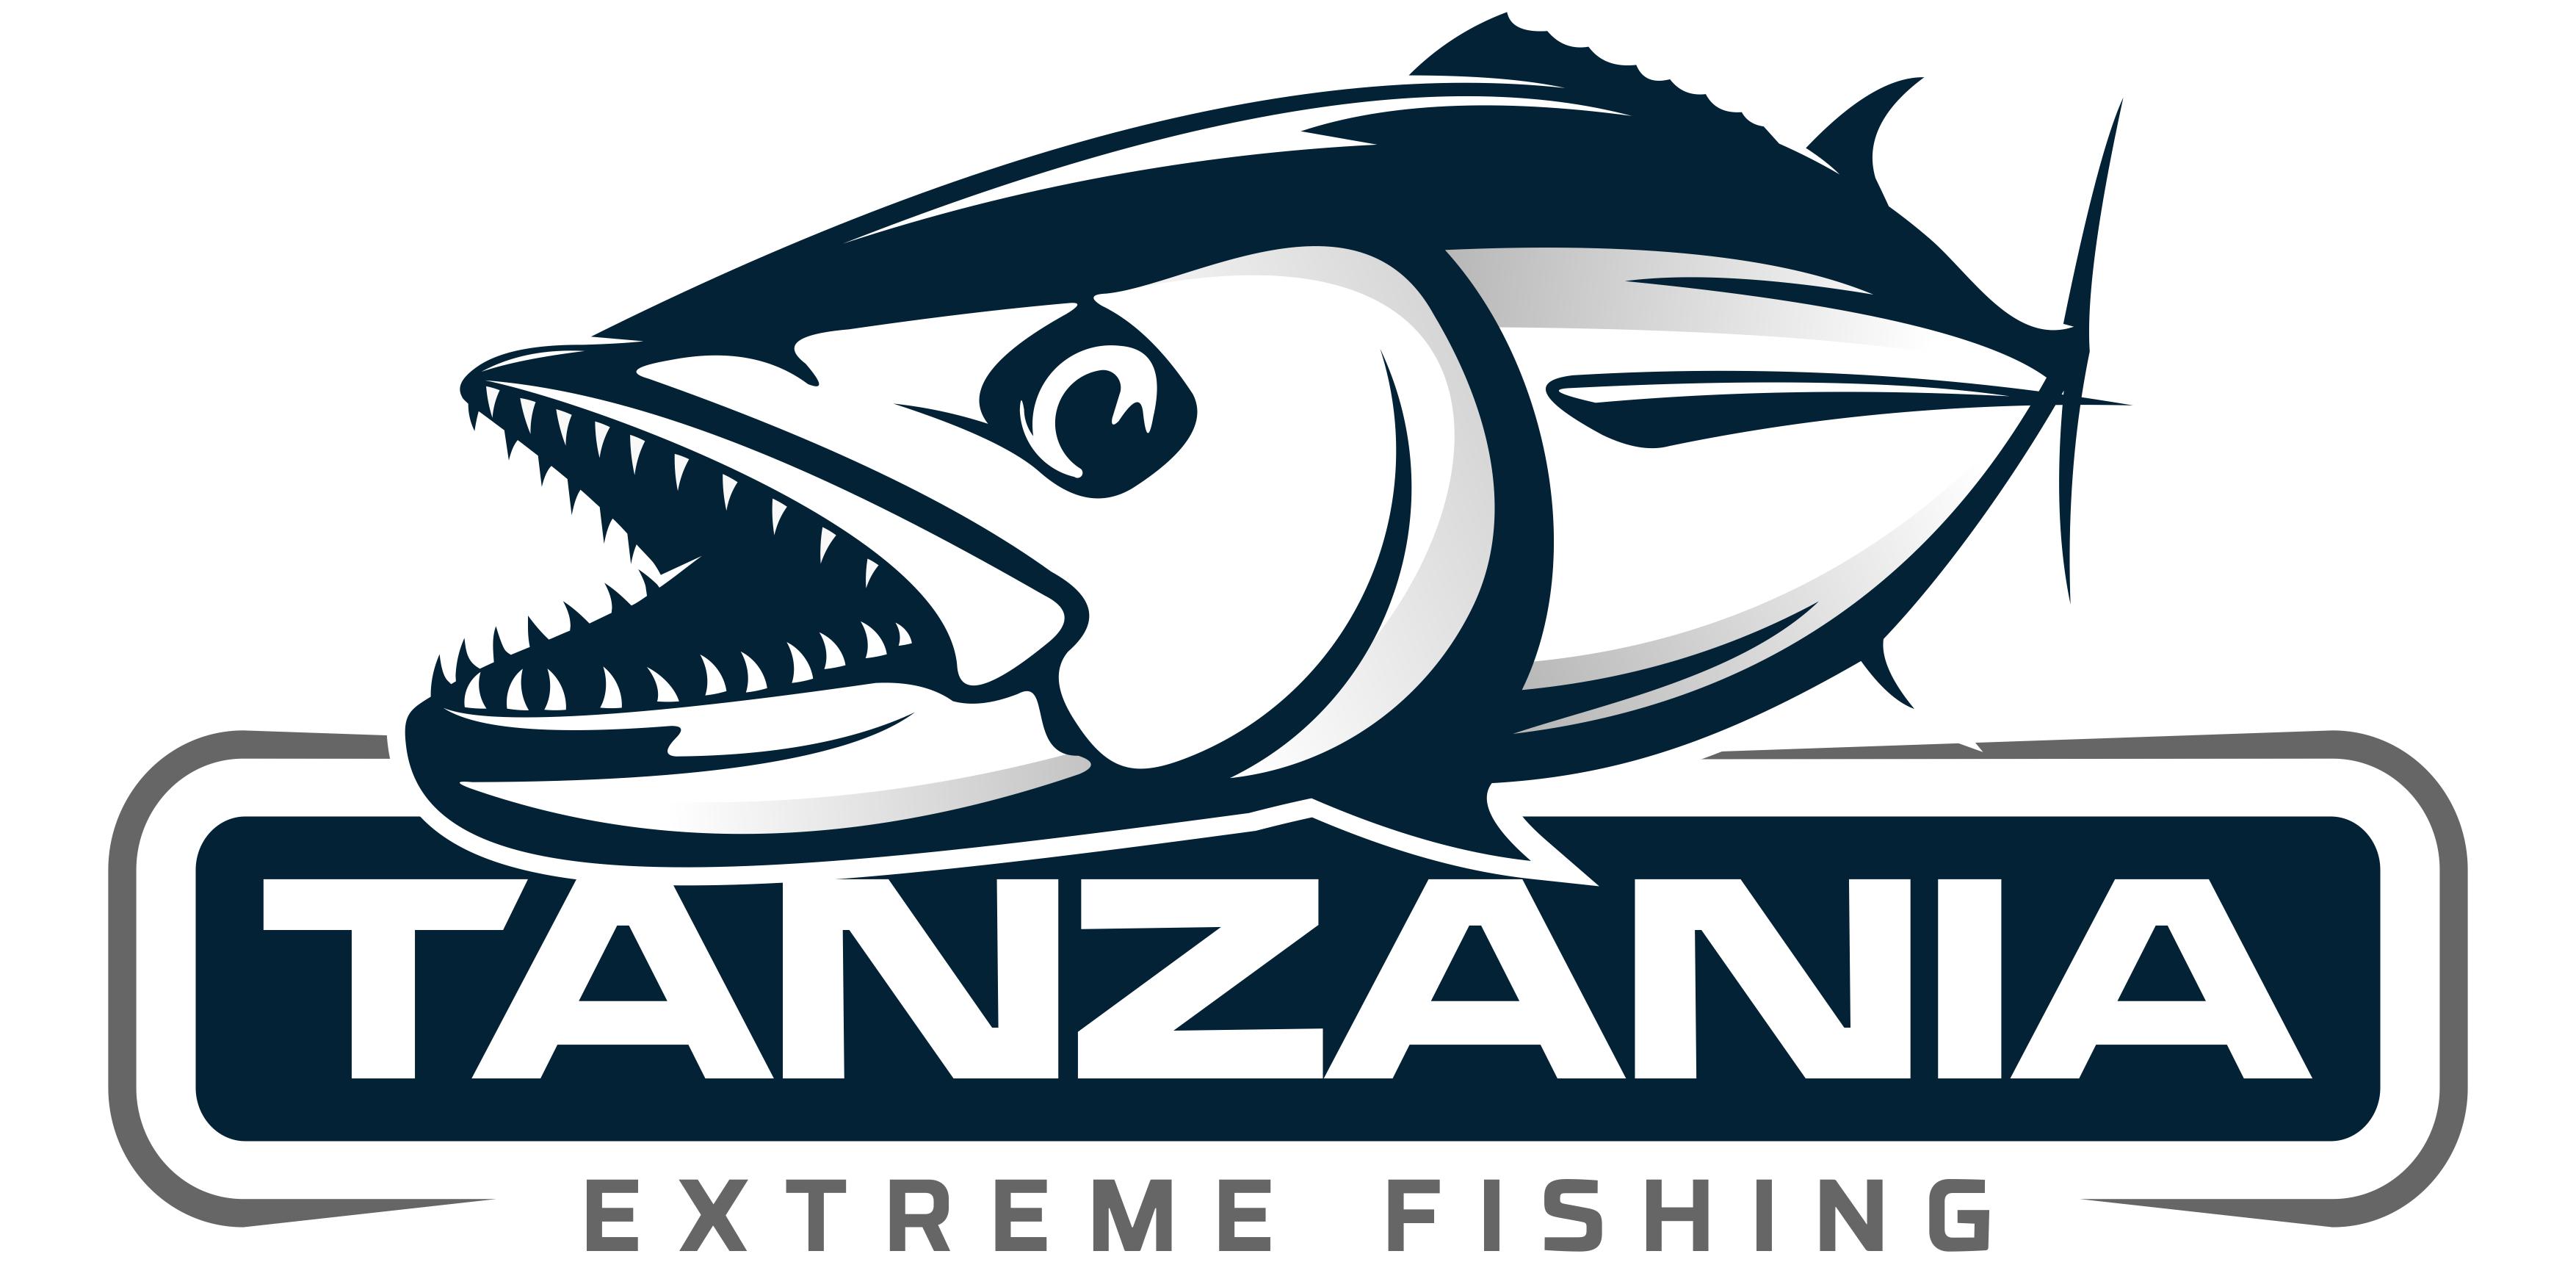 Tanzania Extreme Fishing